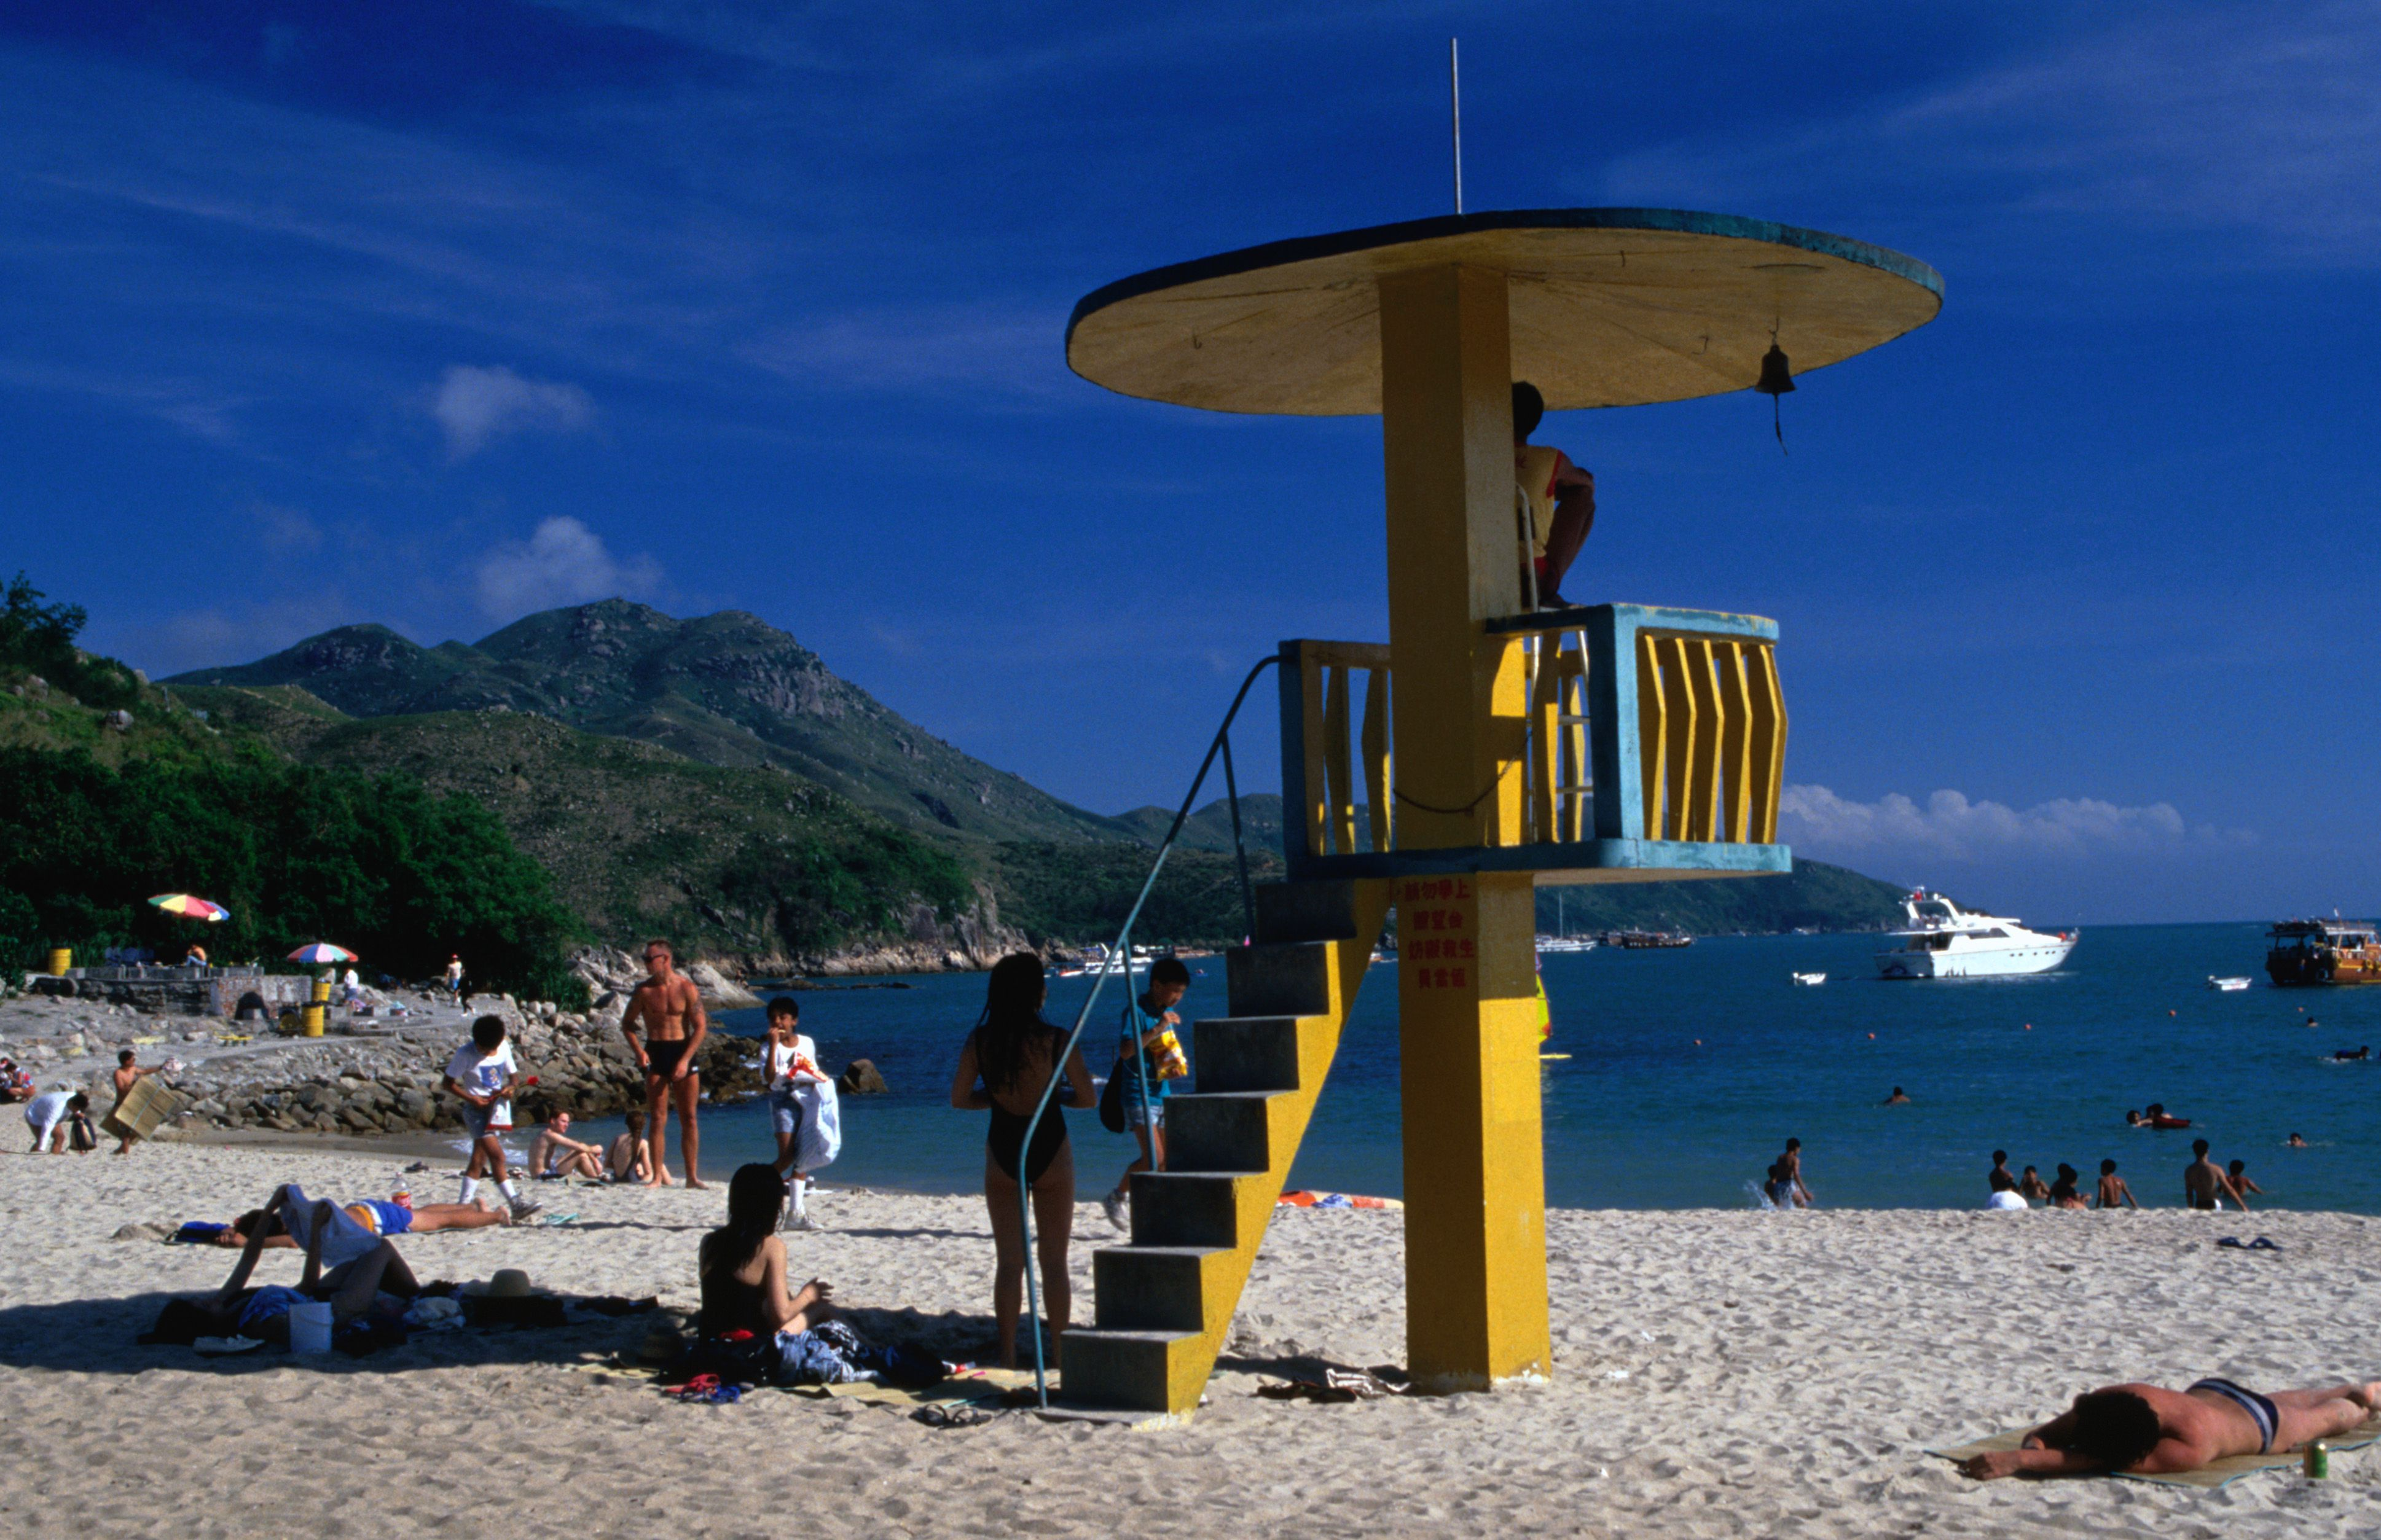 Lifeguard station on Tung Wan Beach